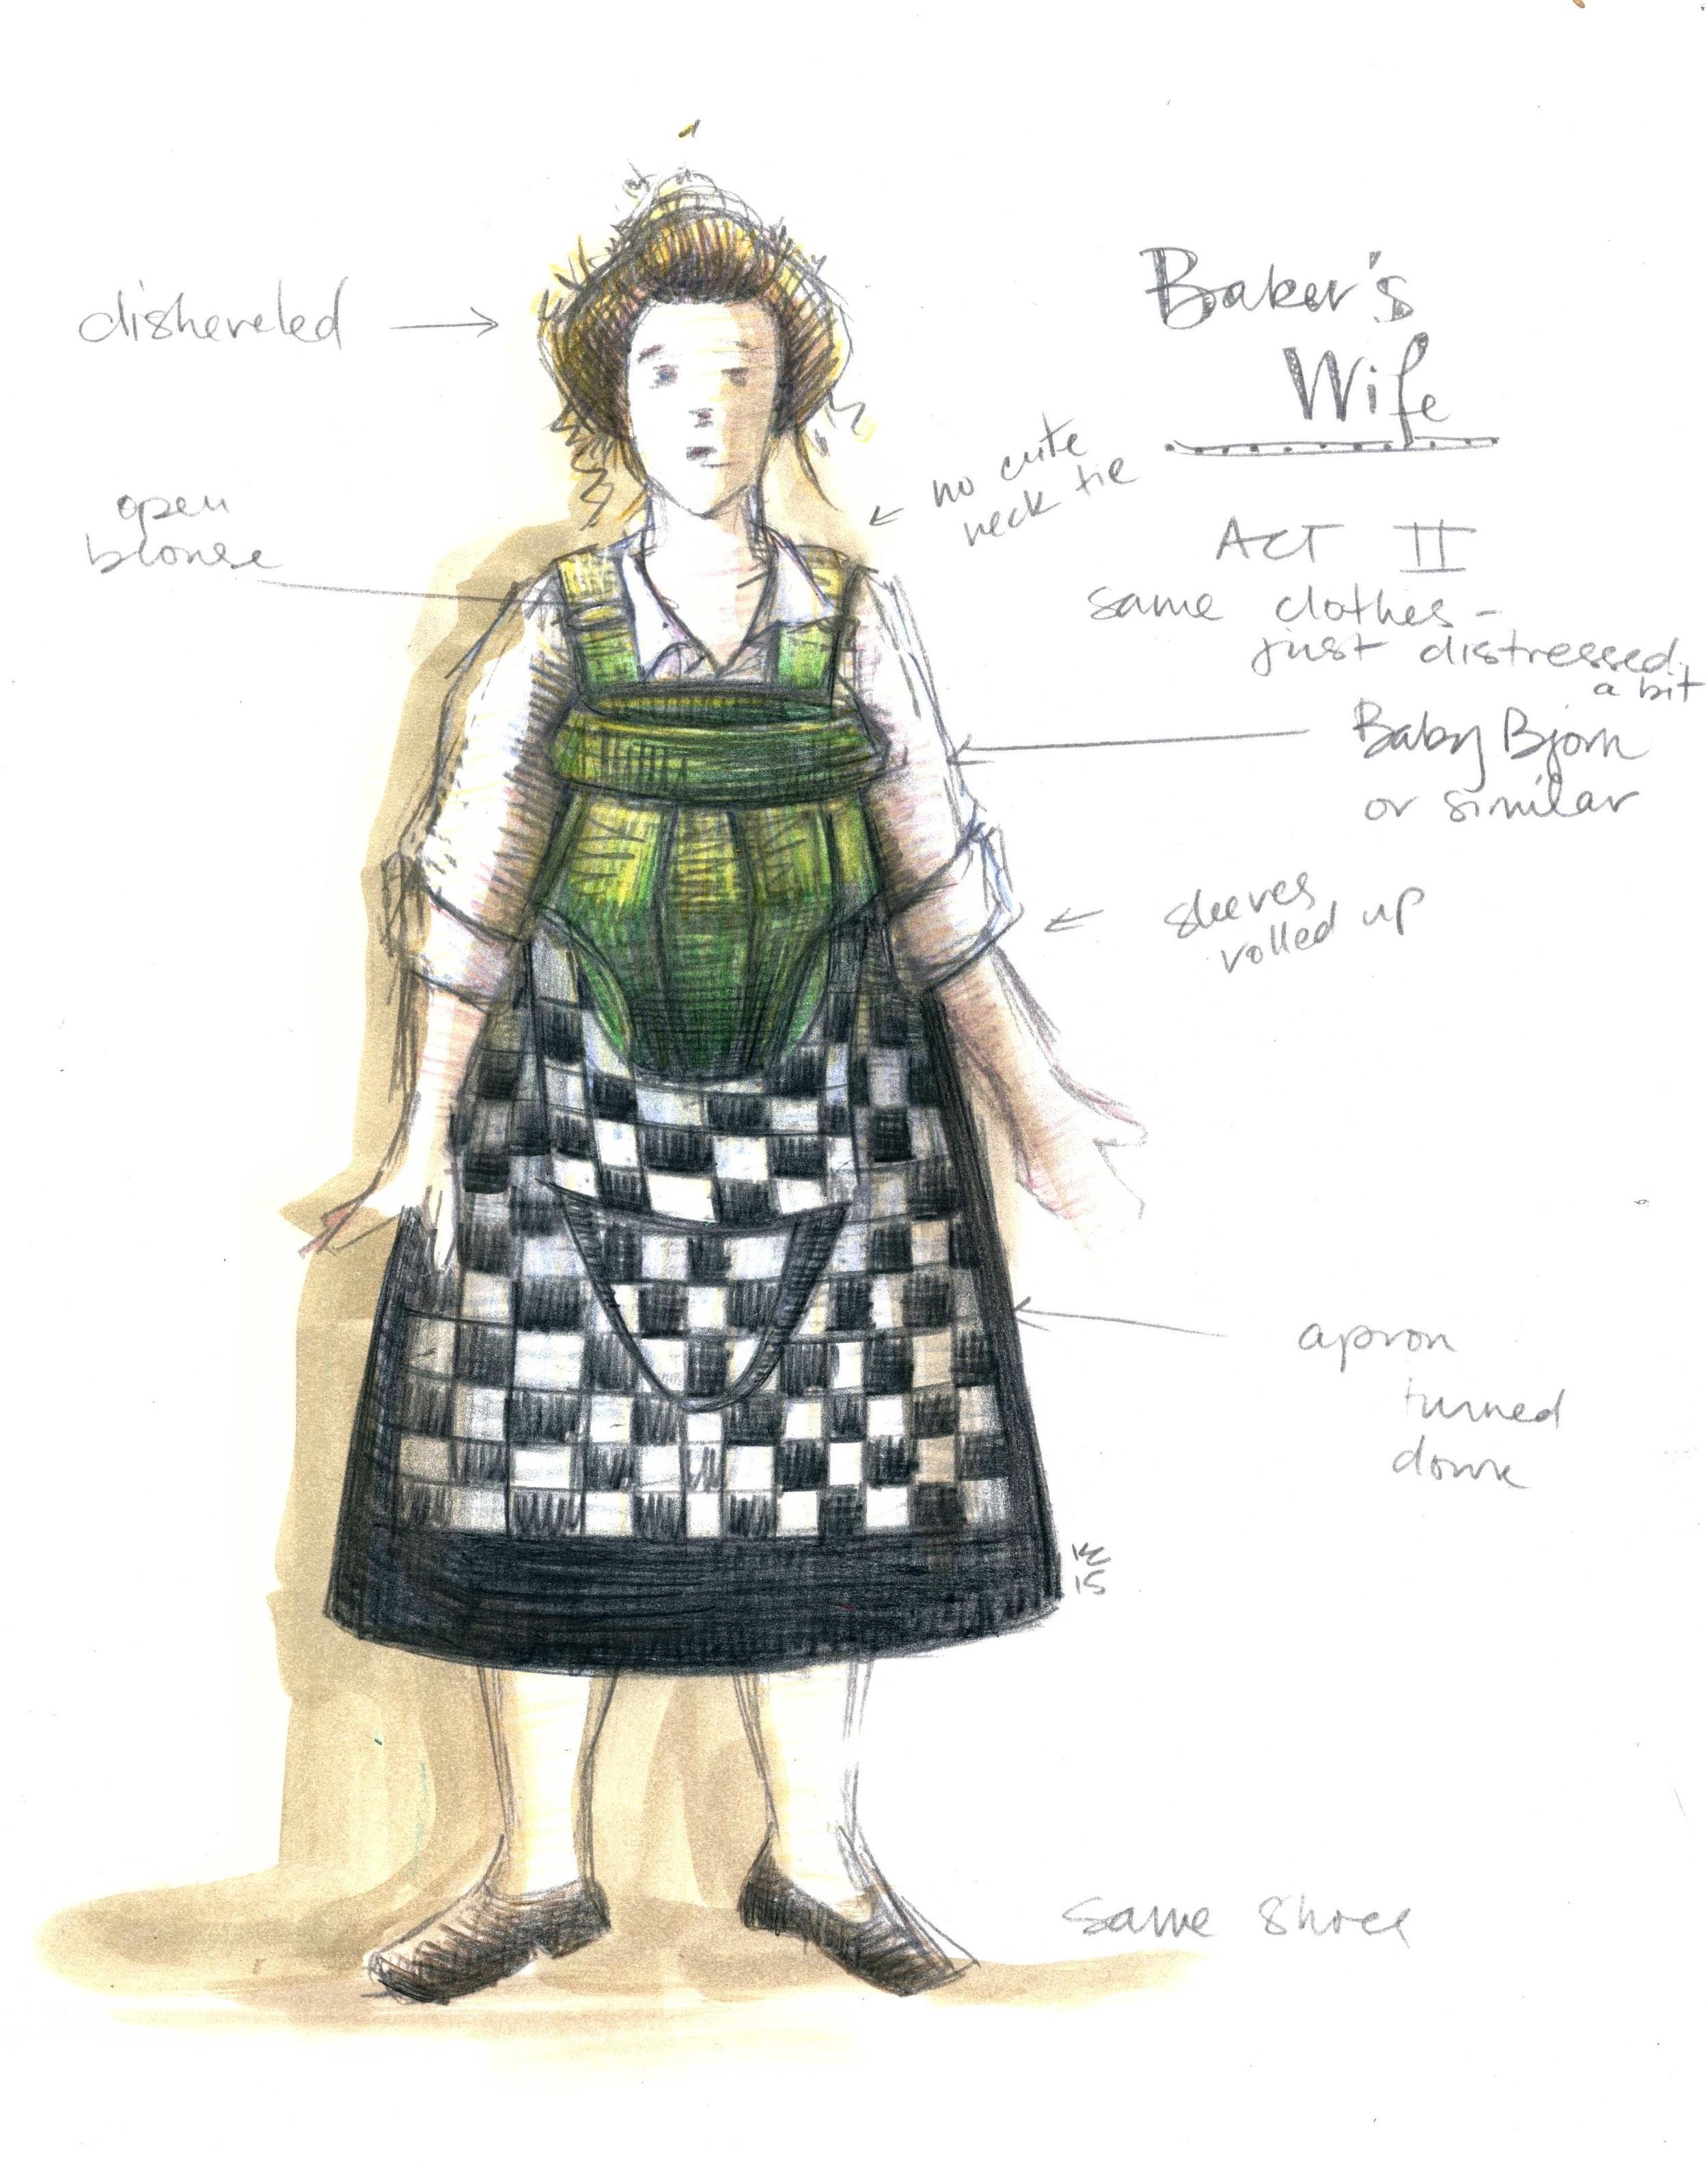 The Baker's Wife: ACT II